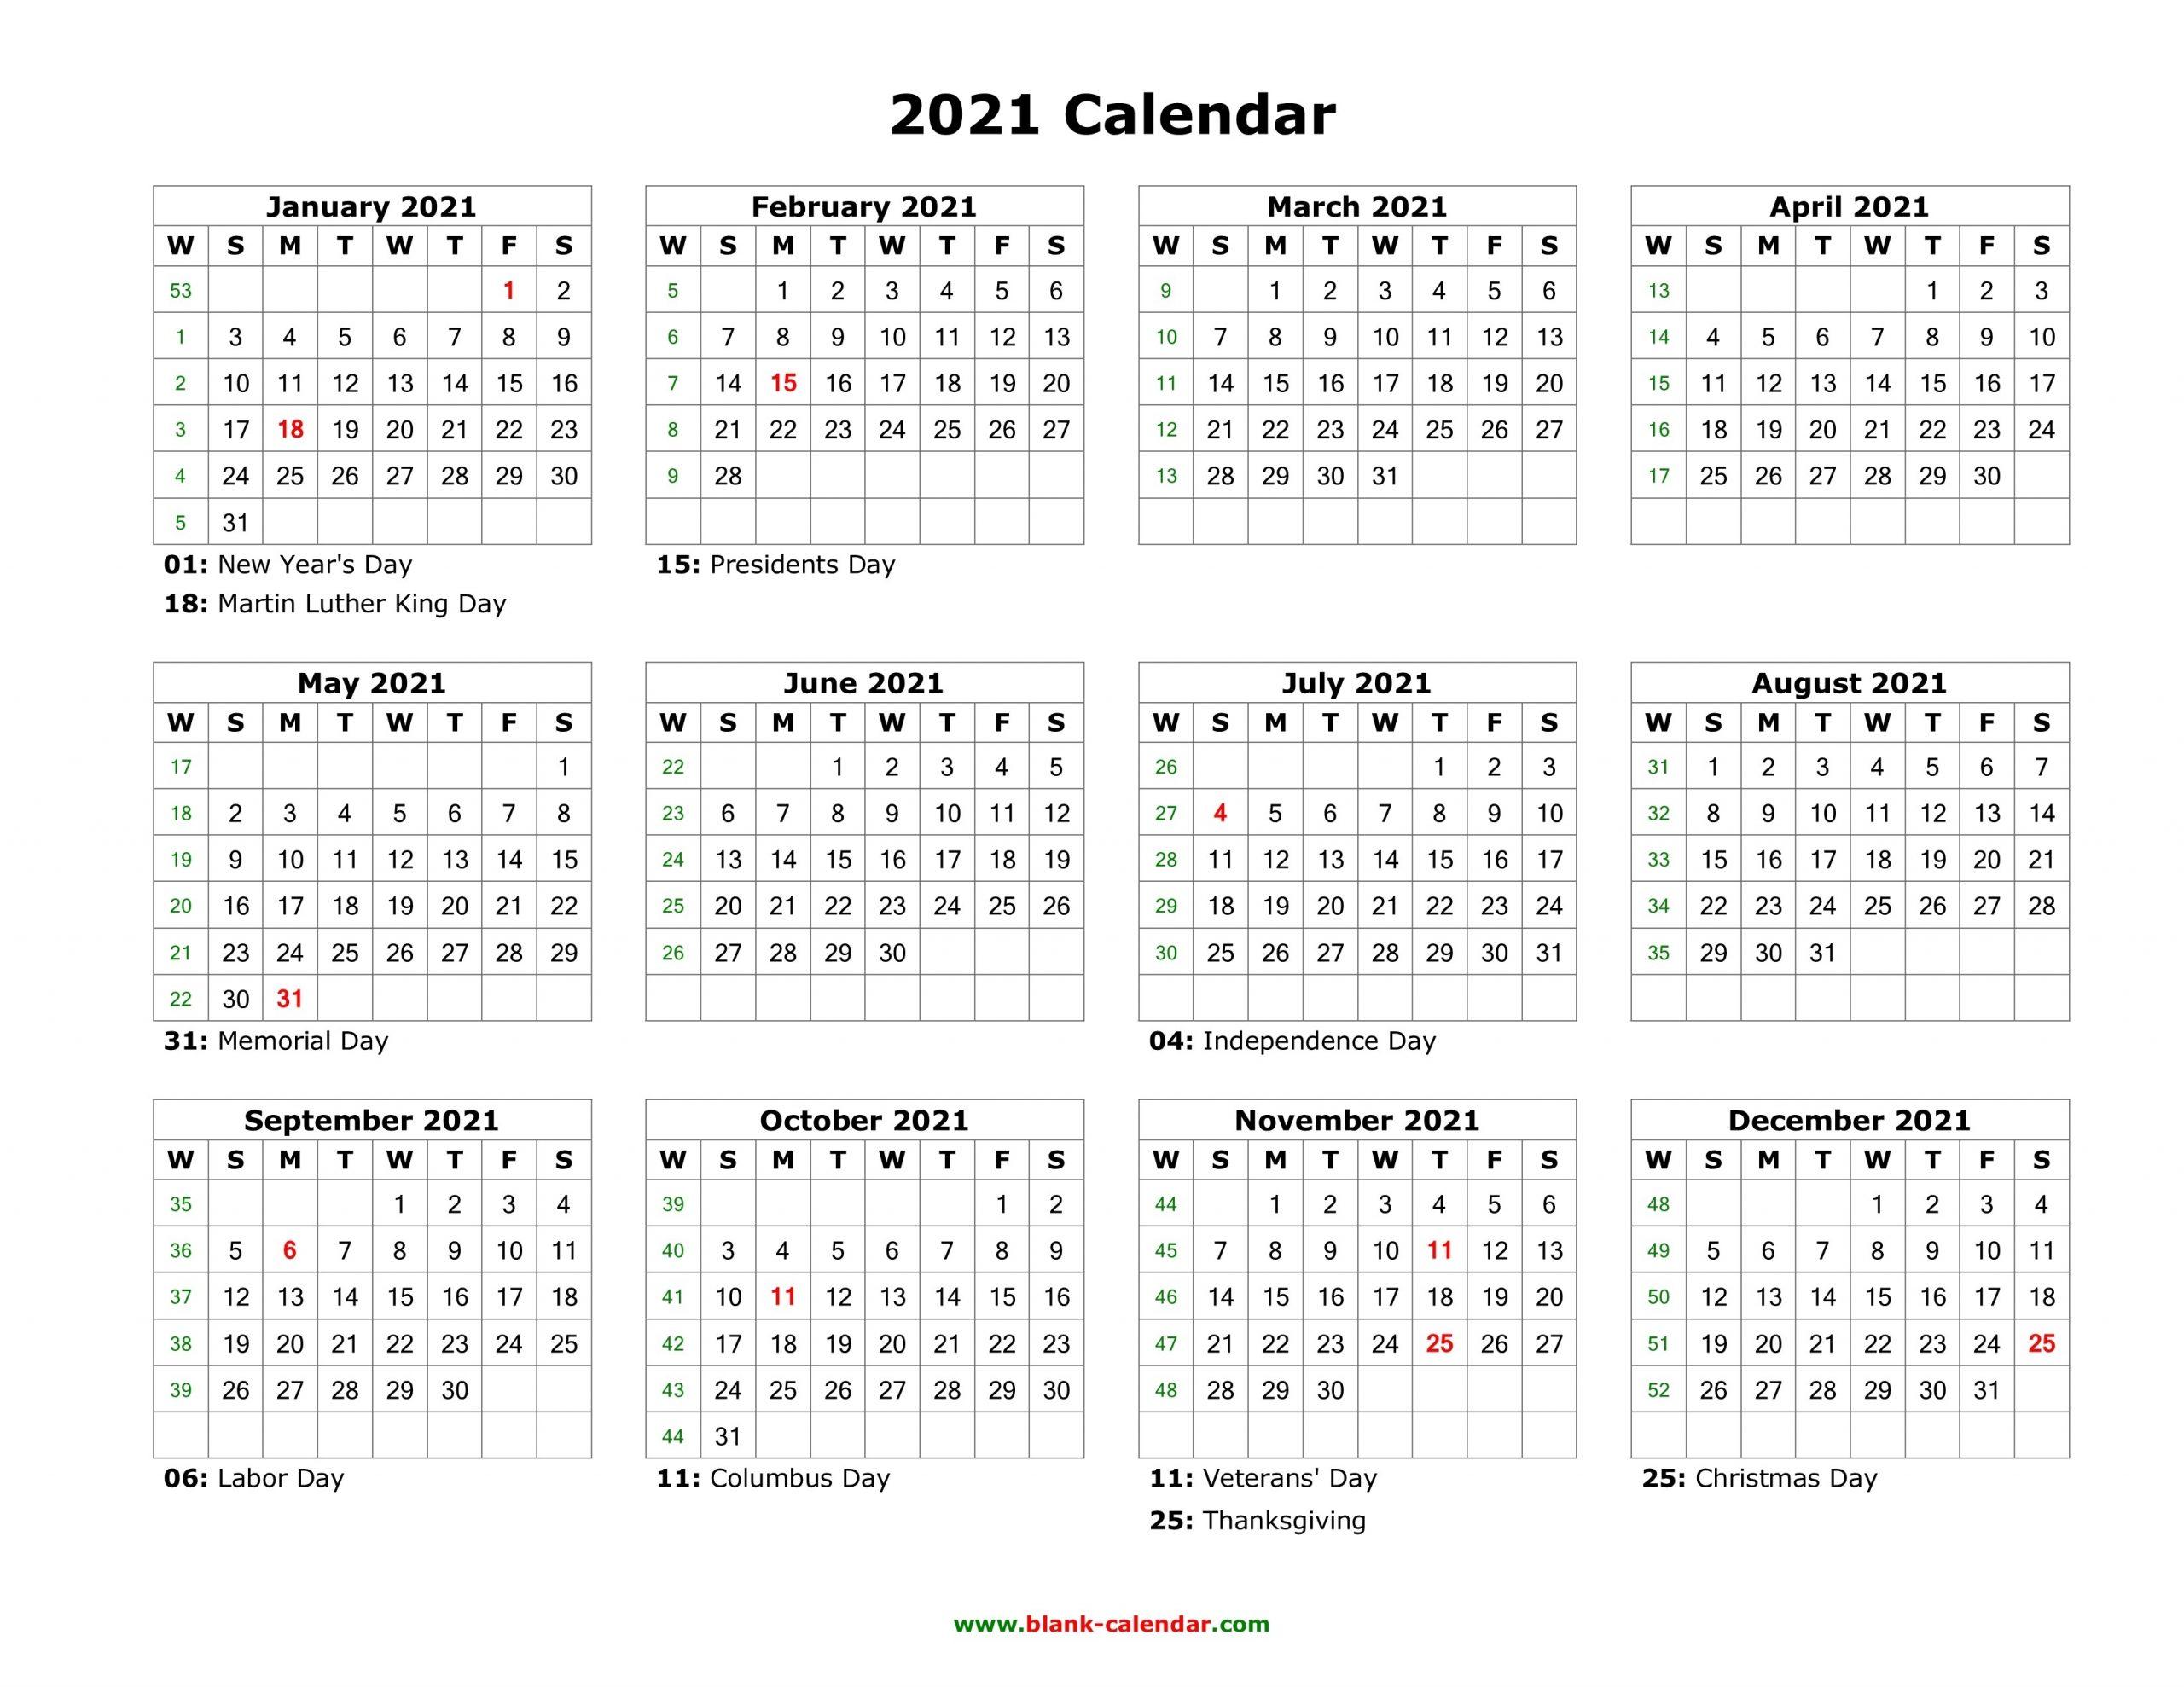 Blank Calendar 2021   Free Download Calendar Templates-Fill In Blank Calendar 2021